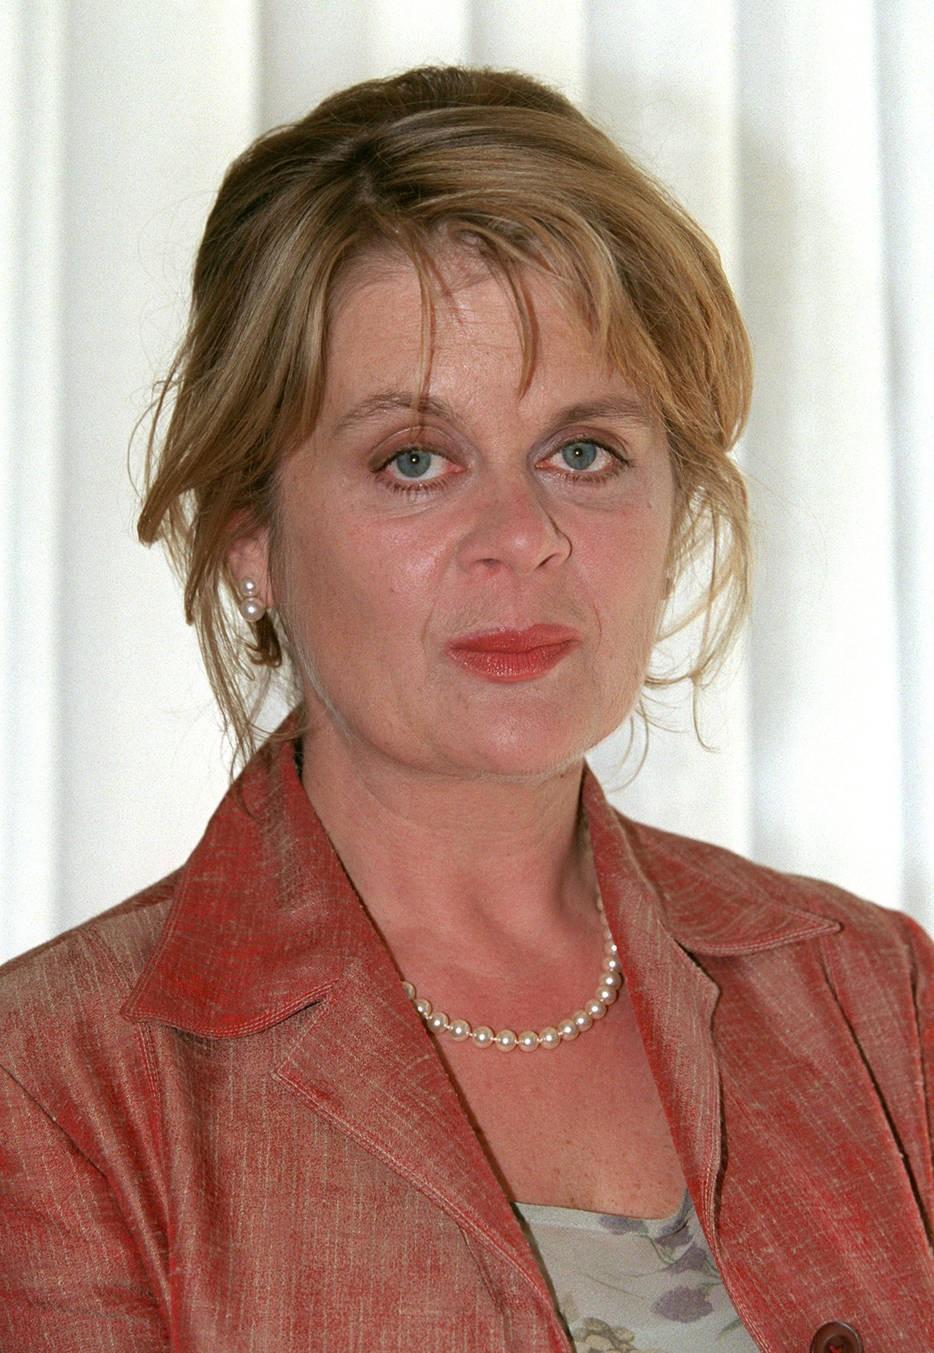 Blonde Lesben hocken Nudelmodell-Agentur